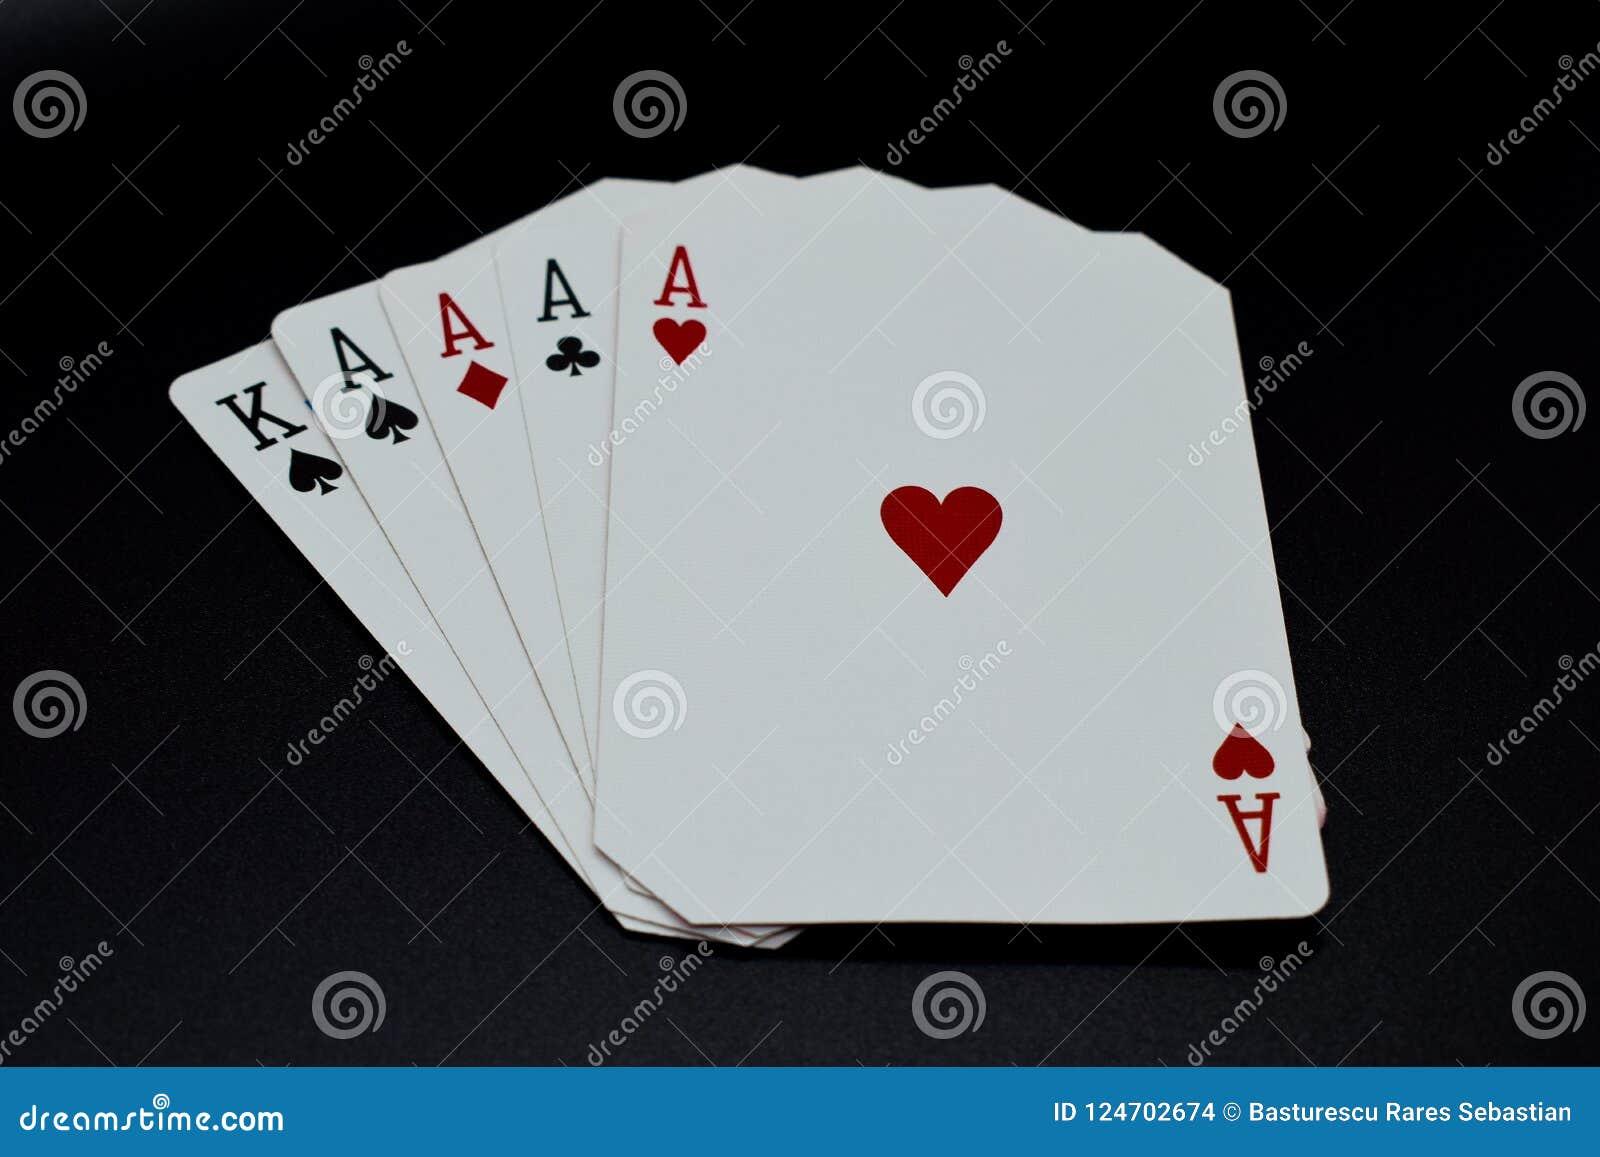 Азарт плей онлайн казино отзывы